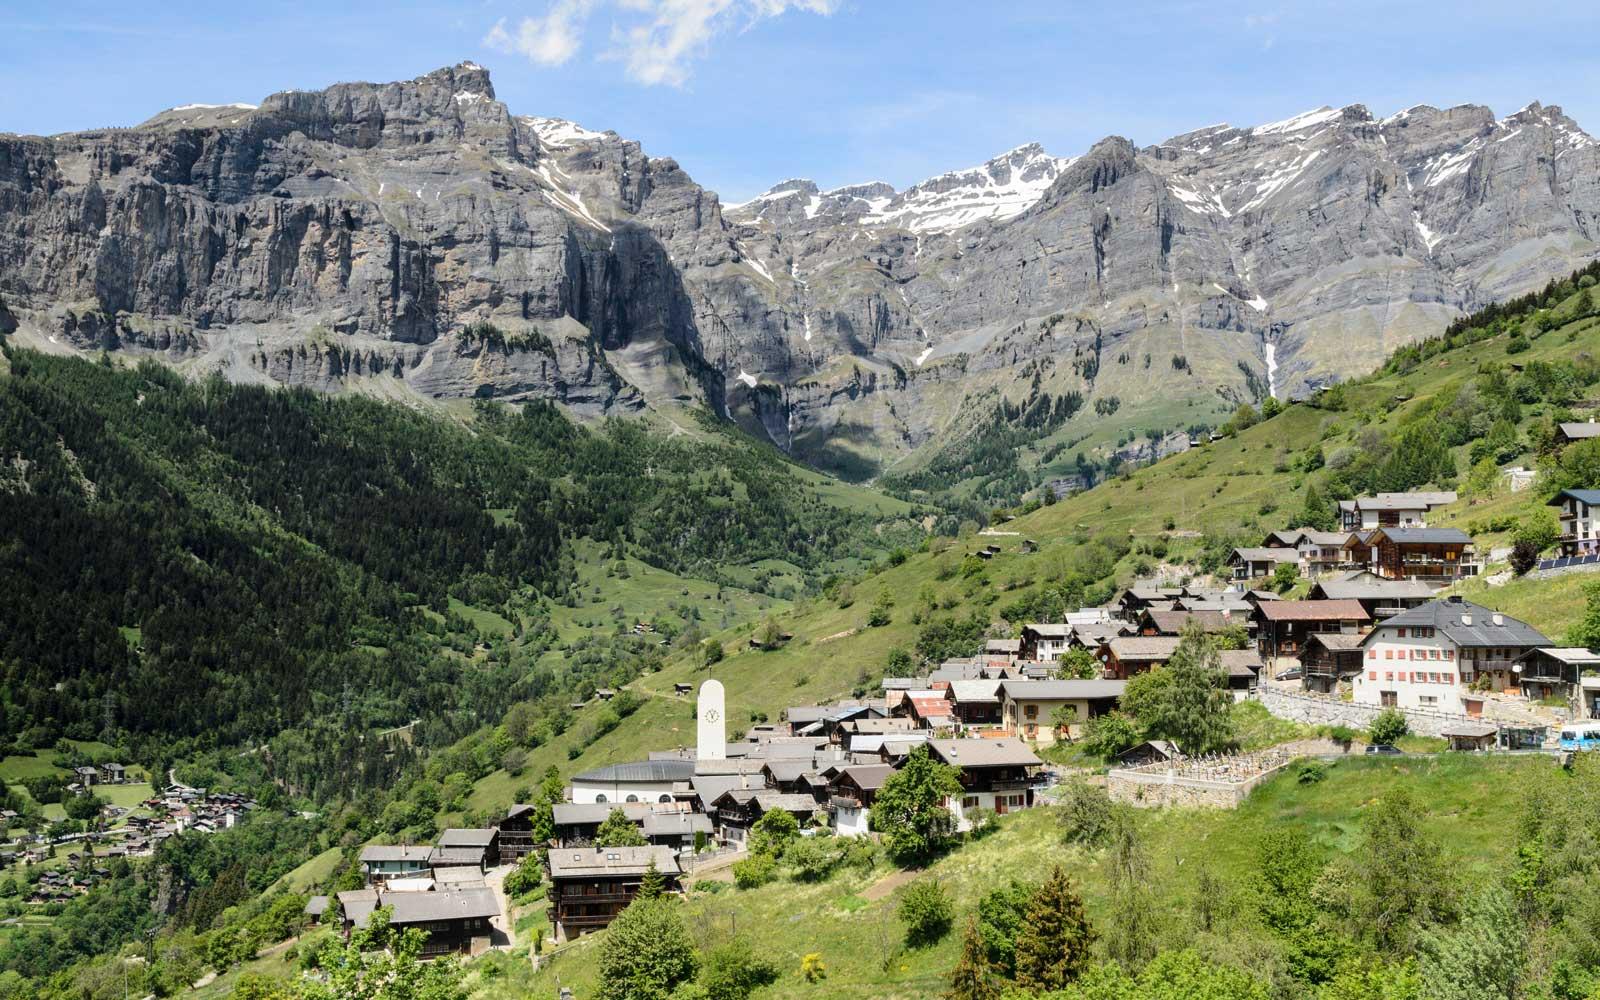 The alpine village of Albinen near Leukerbad, Switzerland.. Image shot 06/2014. Exact date unknown.